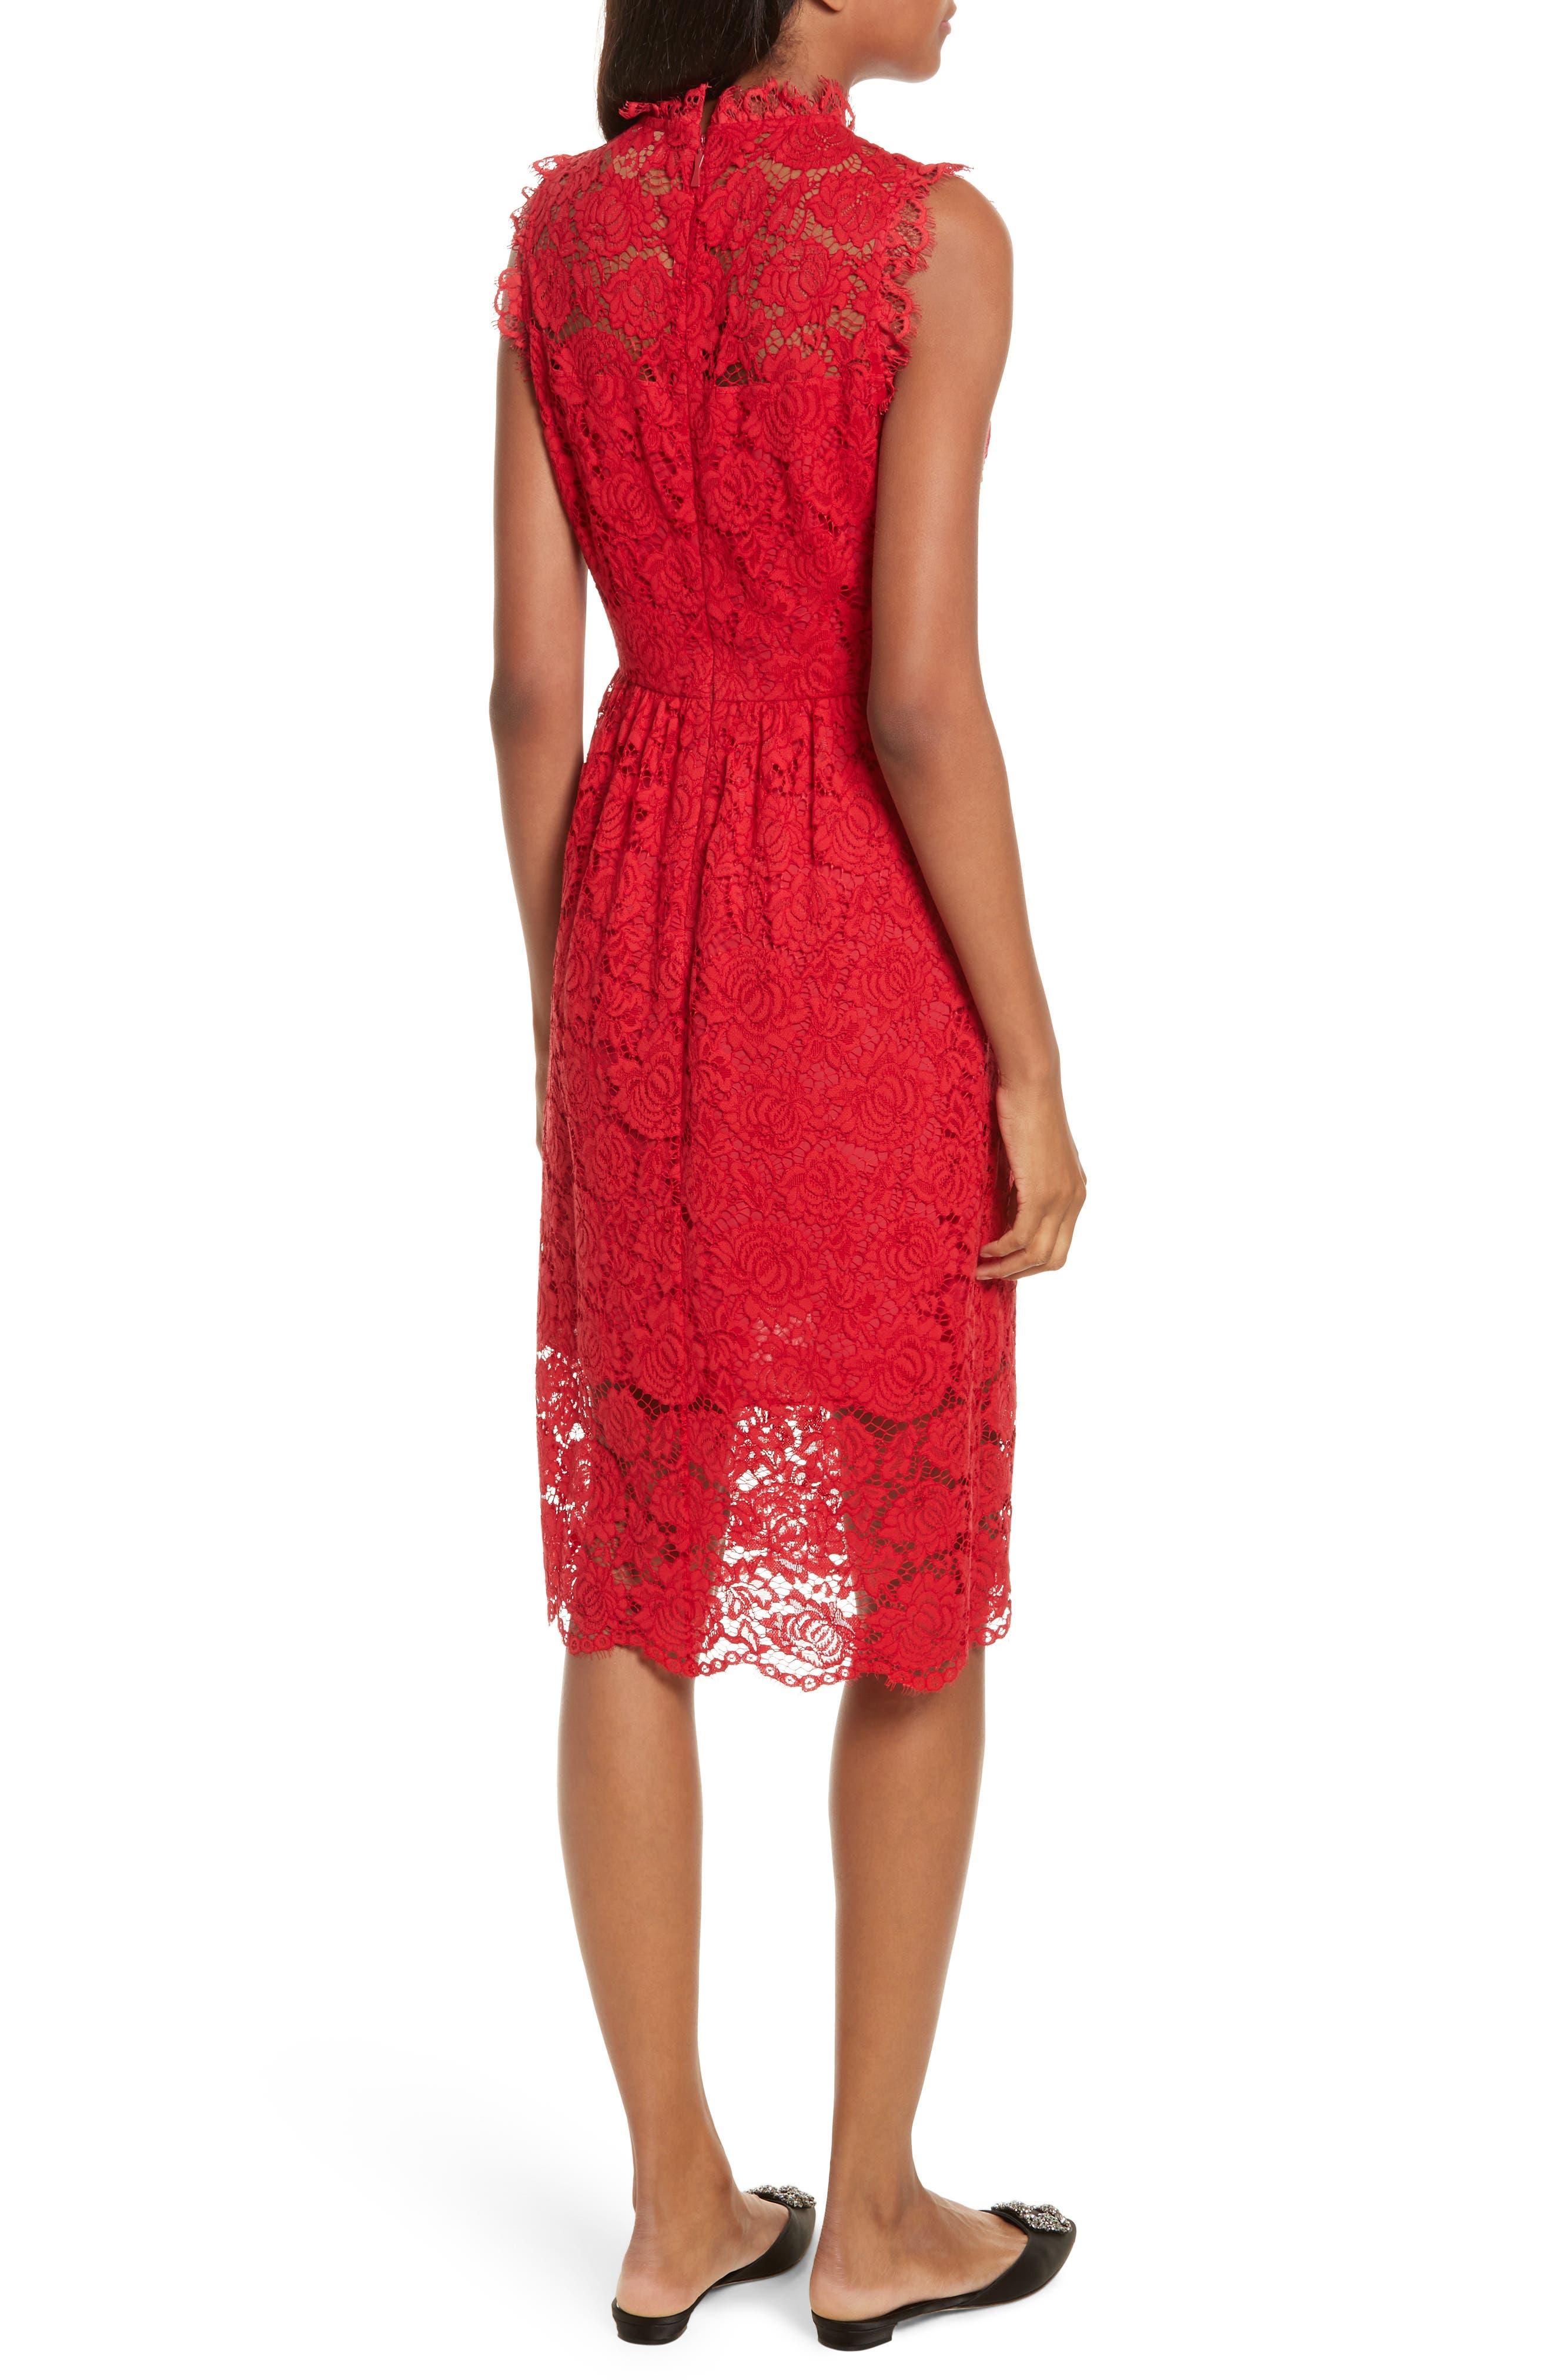 kate spade poppy lace dress,                             Alternate thumbnail 2, color,                             622